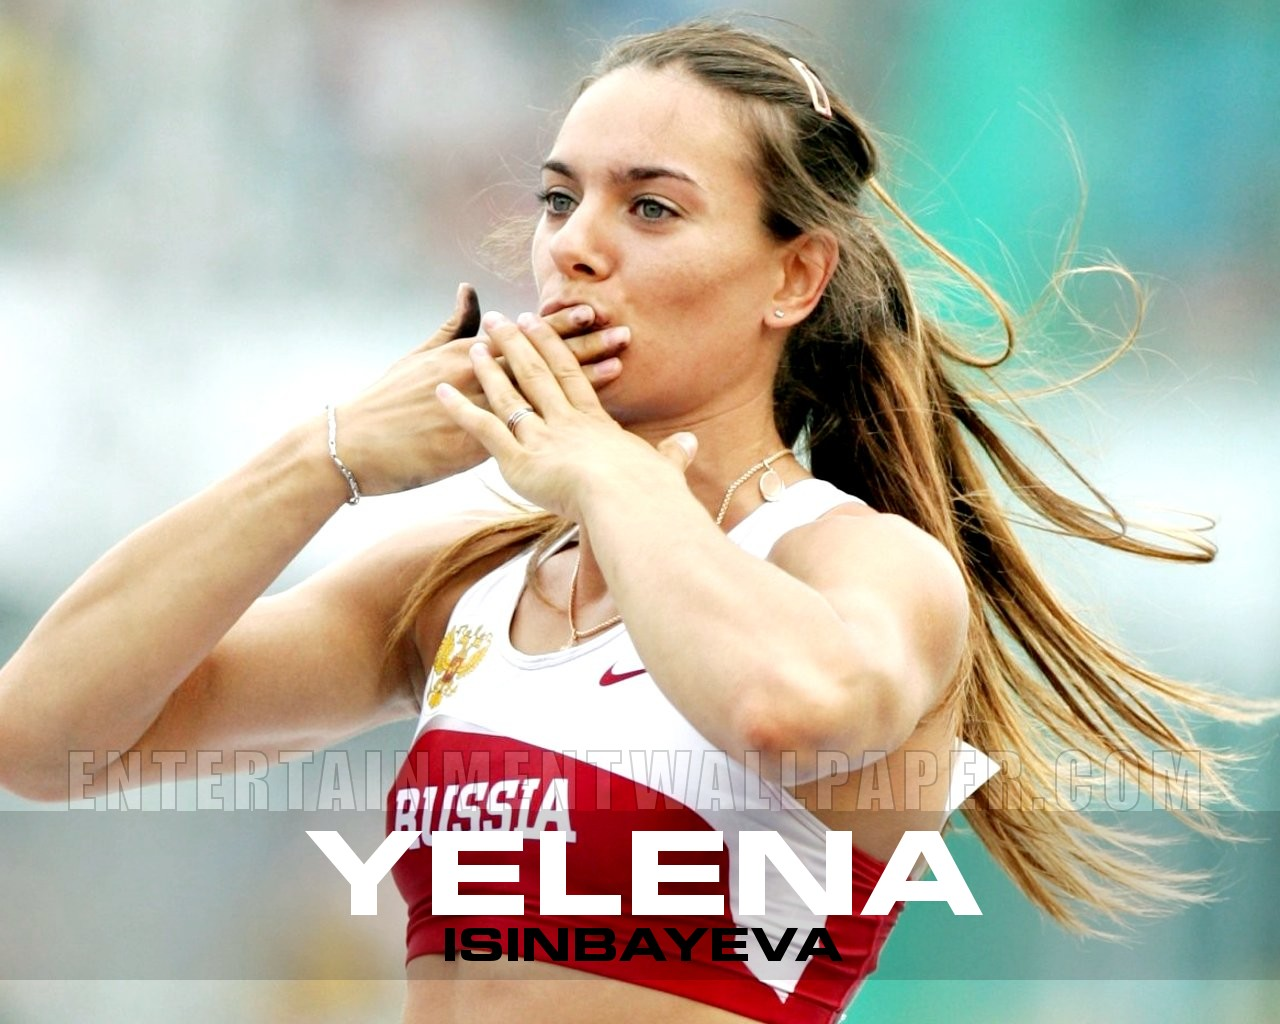 Yelena Isinbayeva Wallpapers - WallpaperSafari